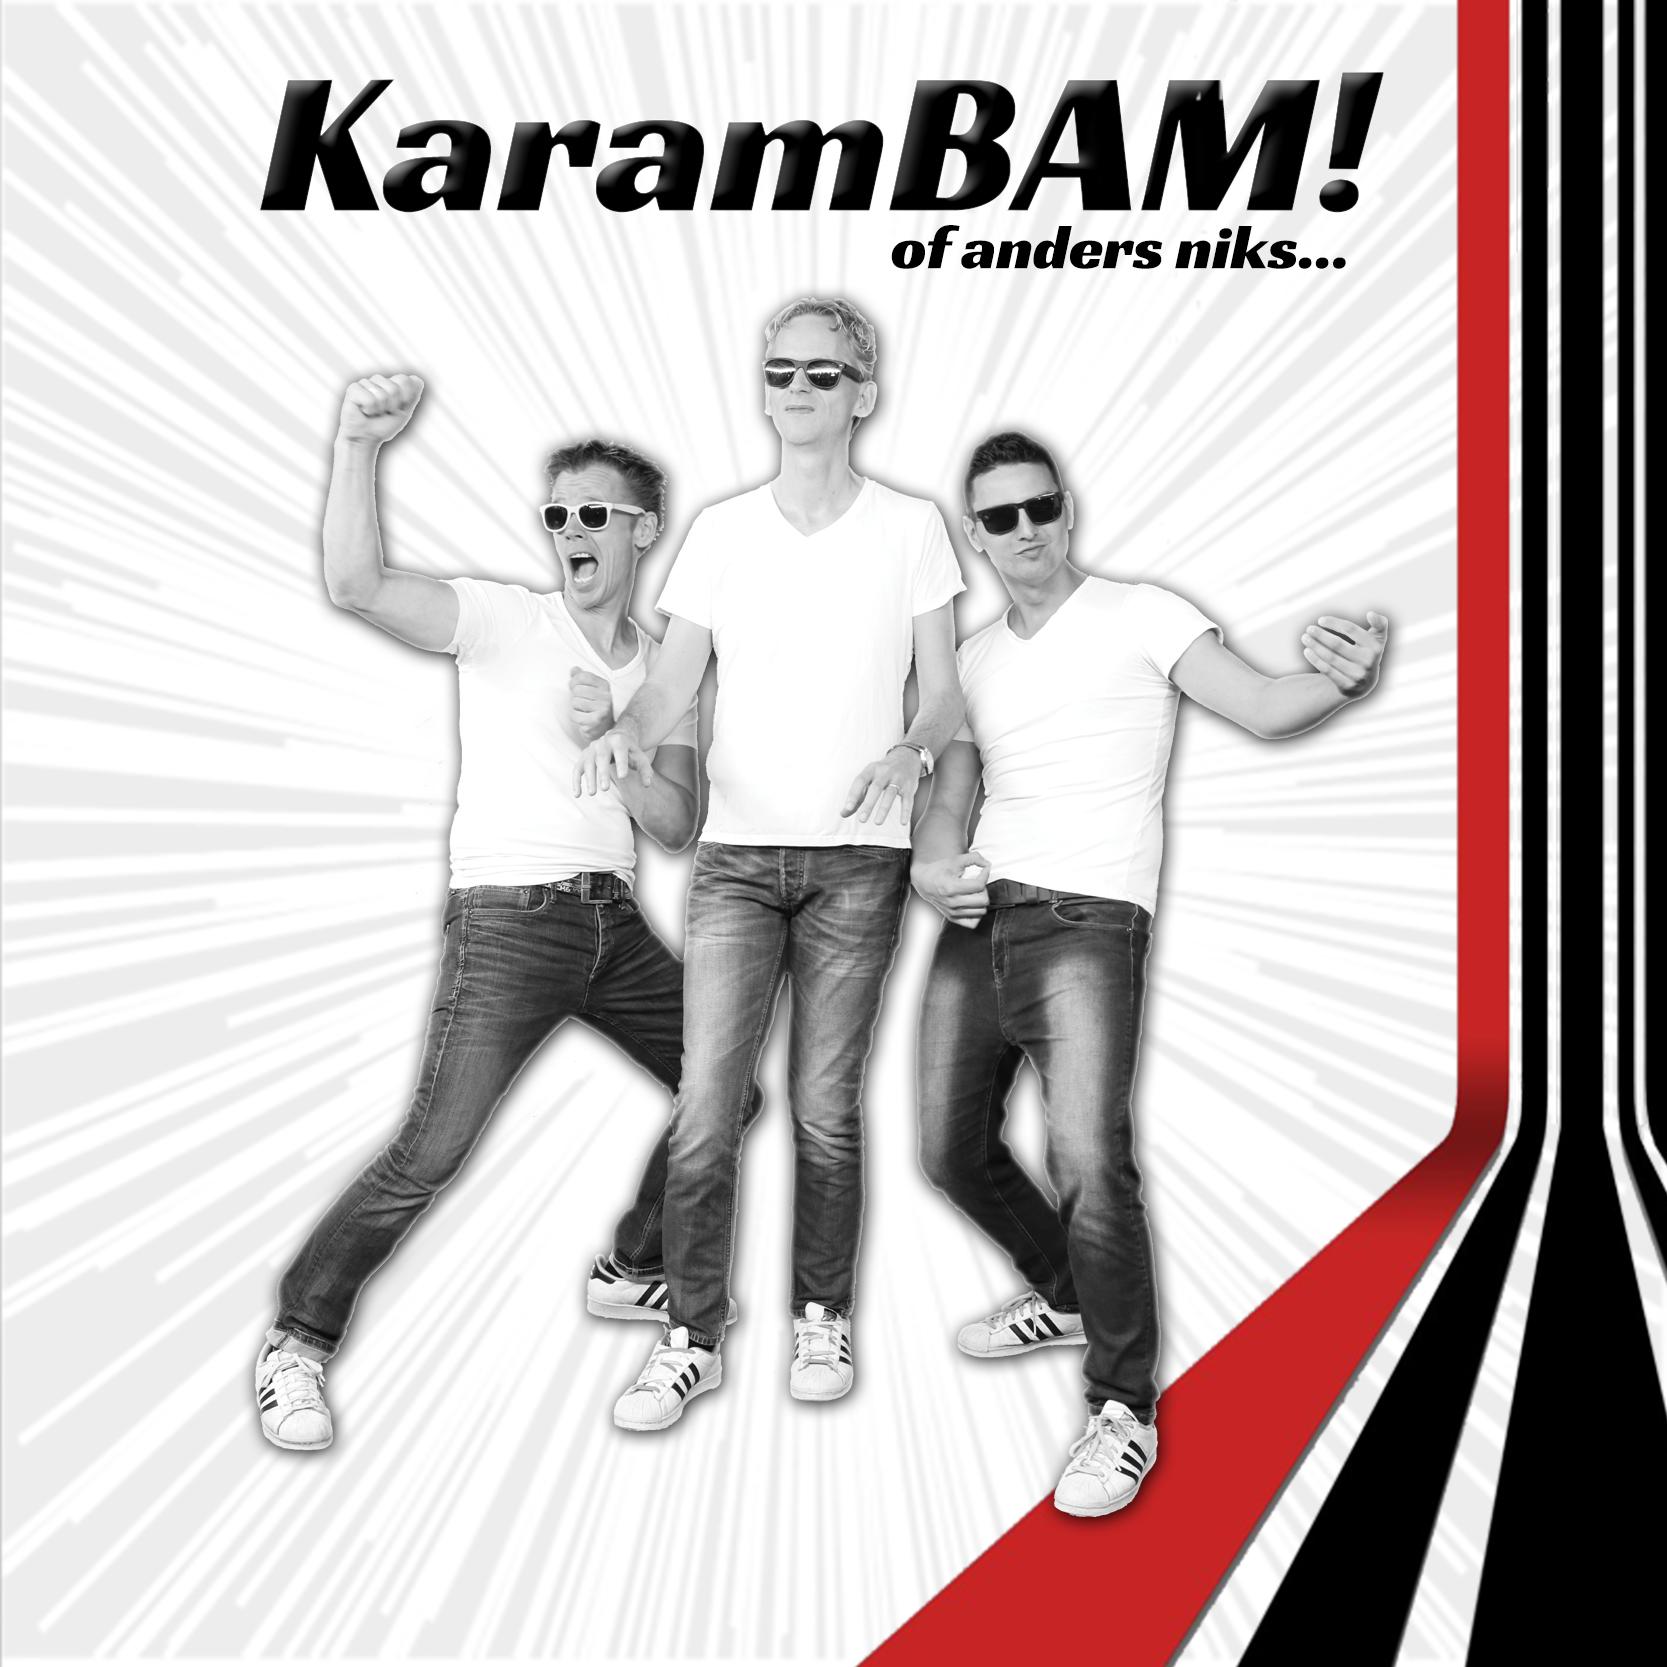 KaramBAM!